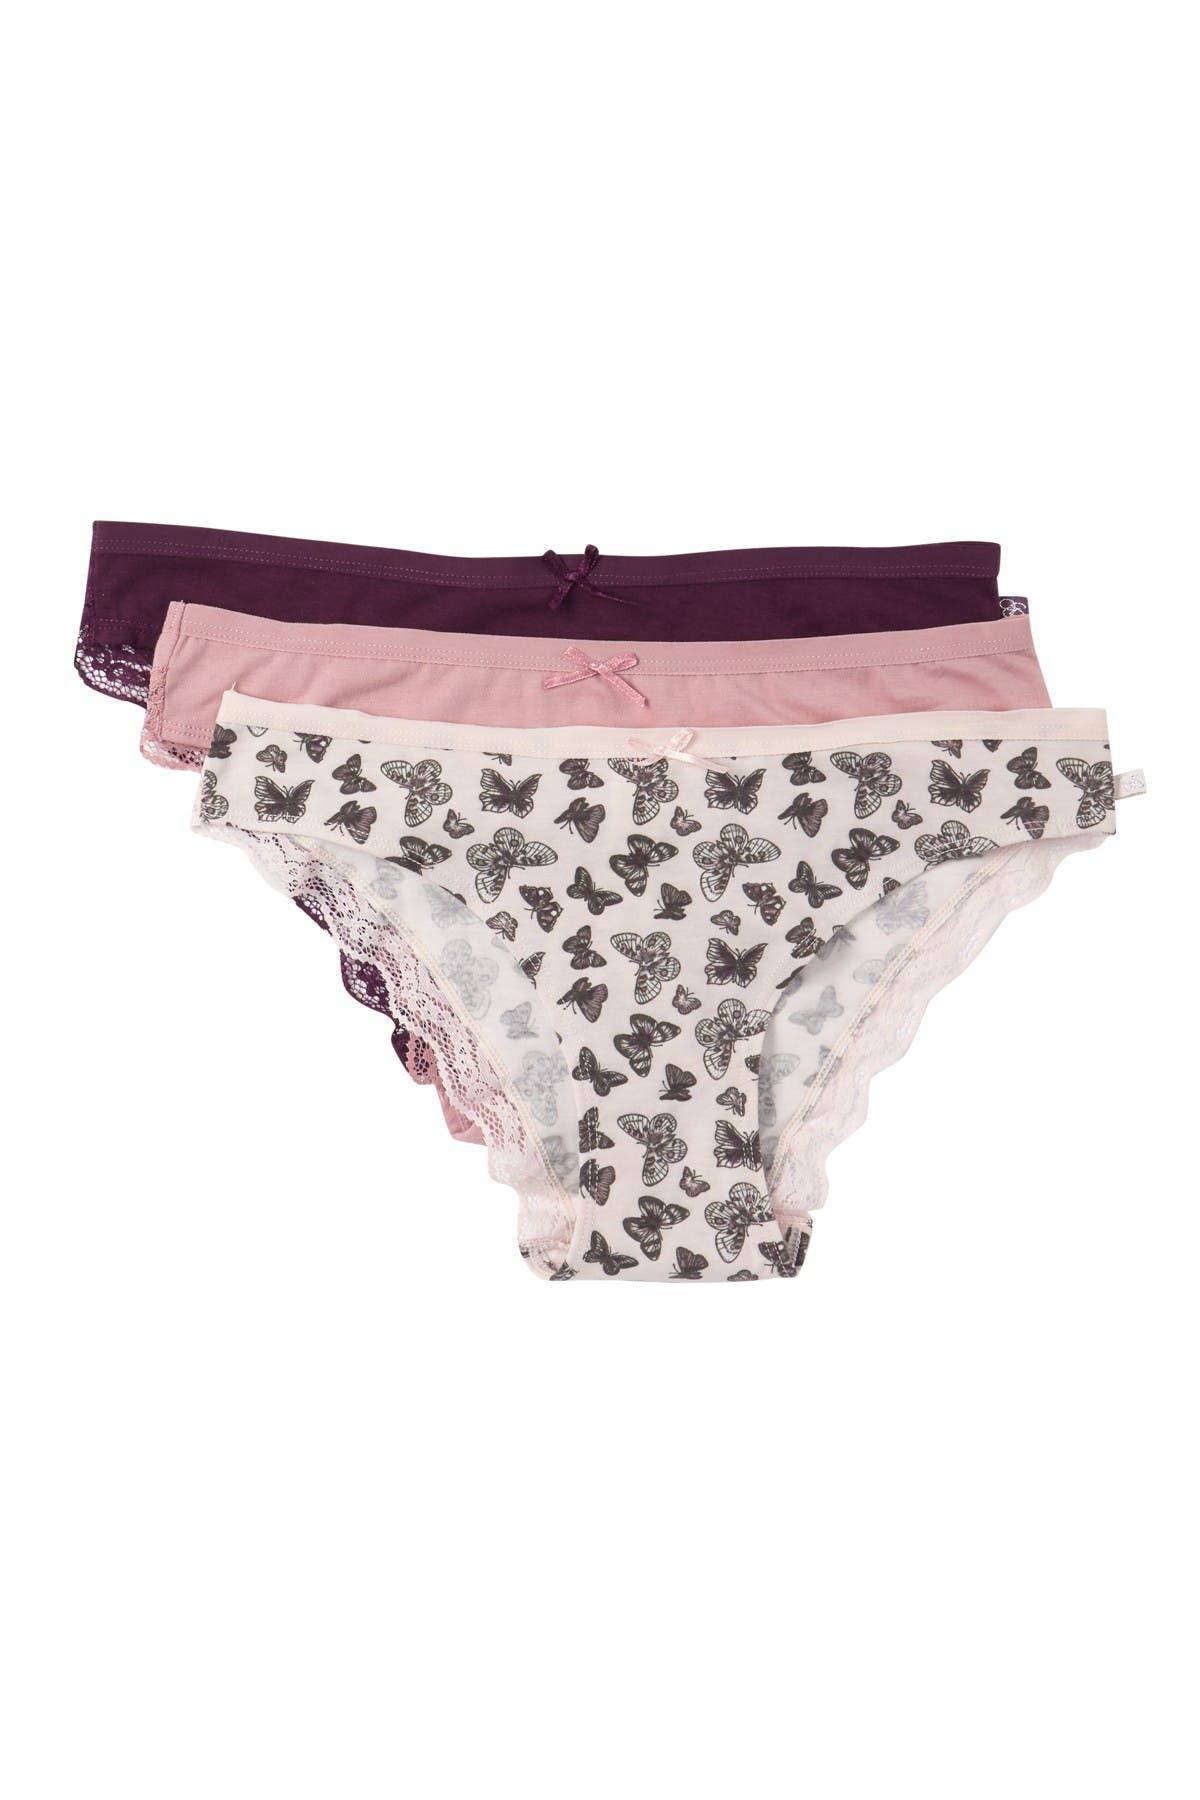 Jessica Simpson Lace Trim Cotton Bikini Panties Pack Of 3 Nordstrom Rack